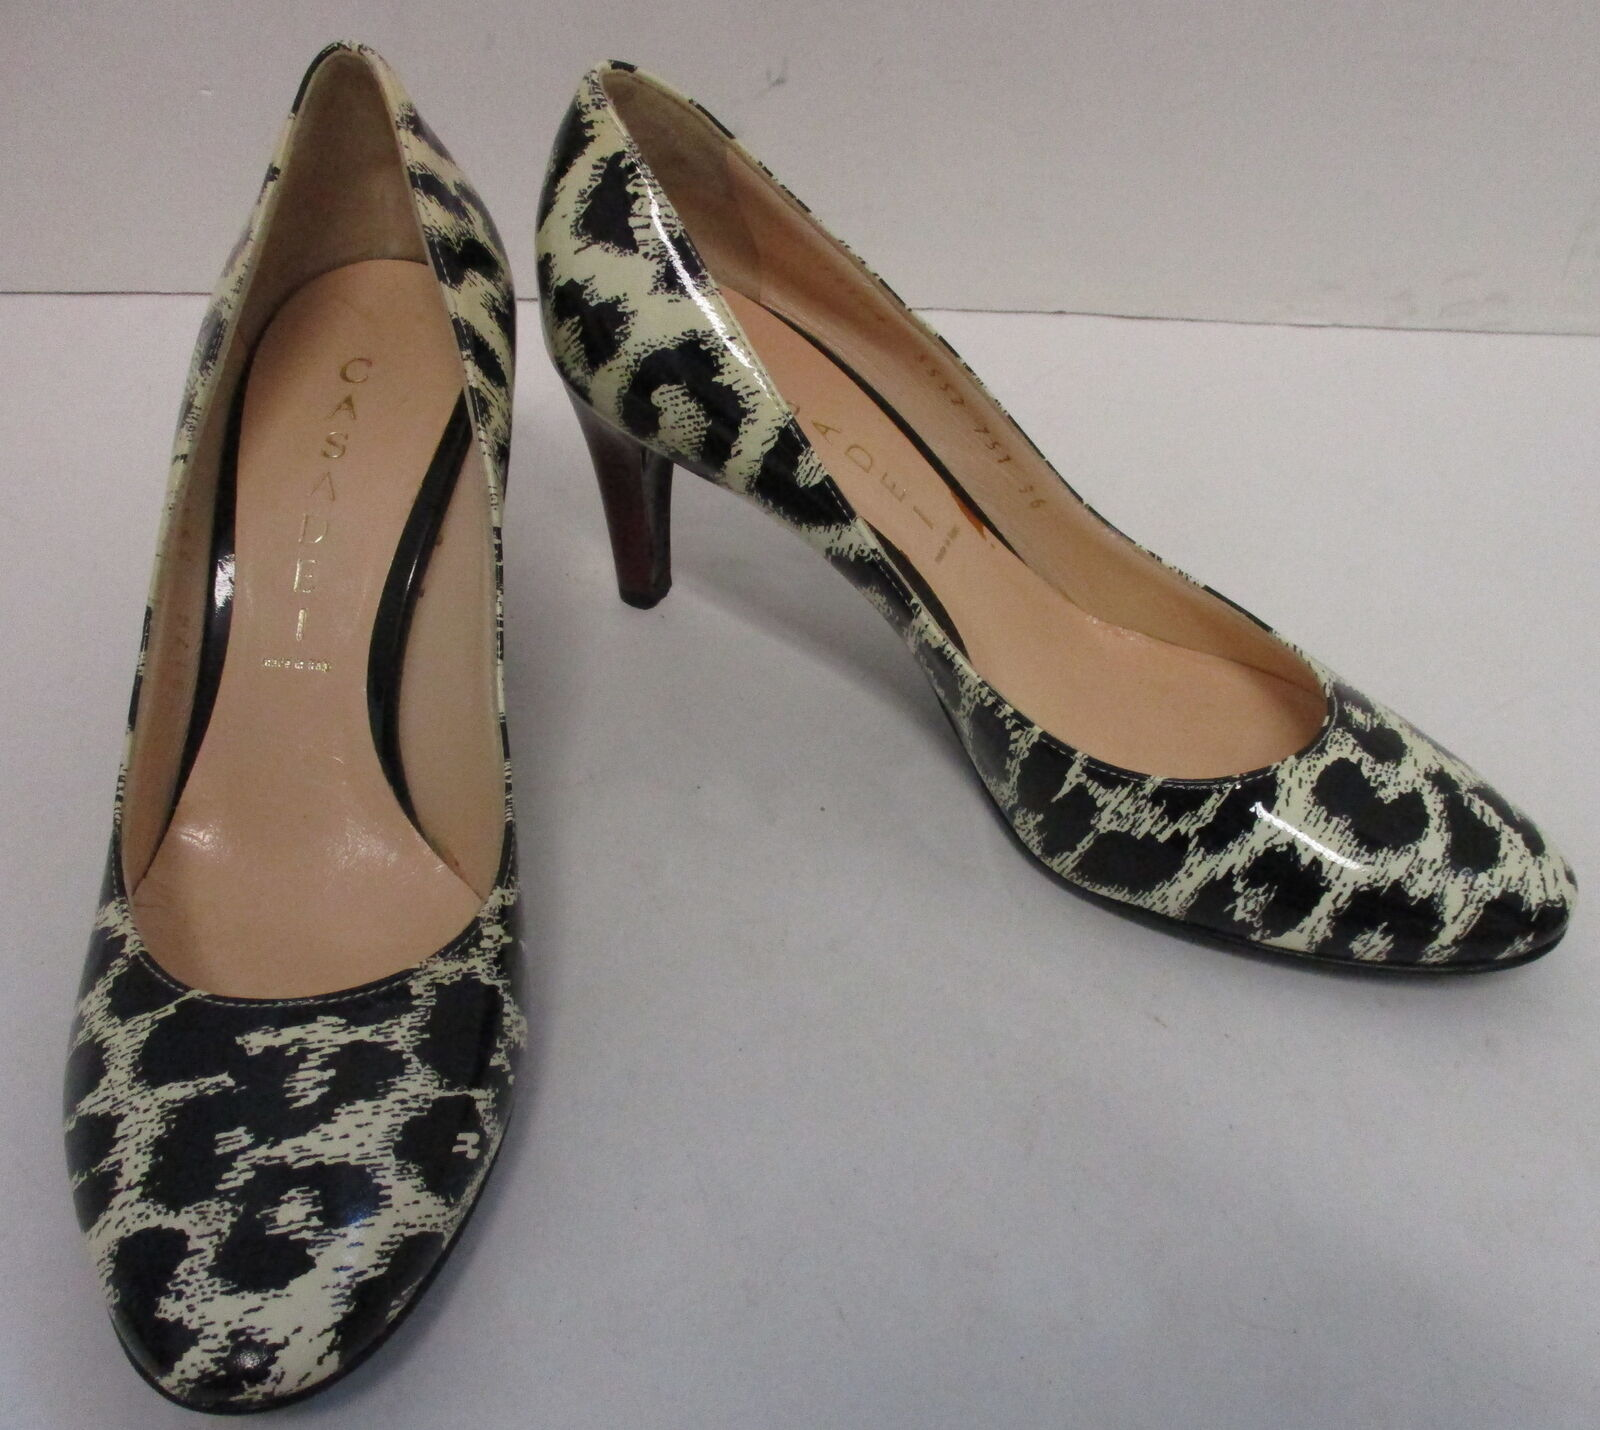 Casadei Charol Charol Charol Negro Leopardo De Salón Tacón Rojo Marfil Talla 36  venta mundialmente famosa en línea